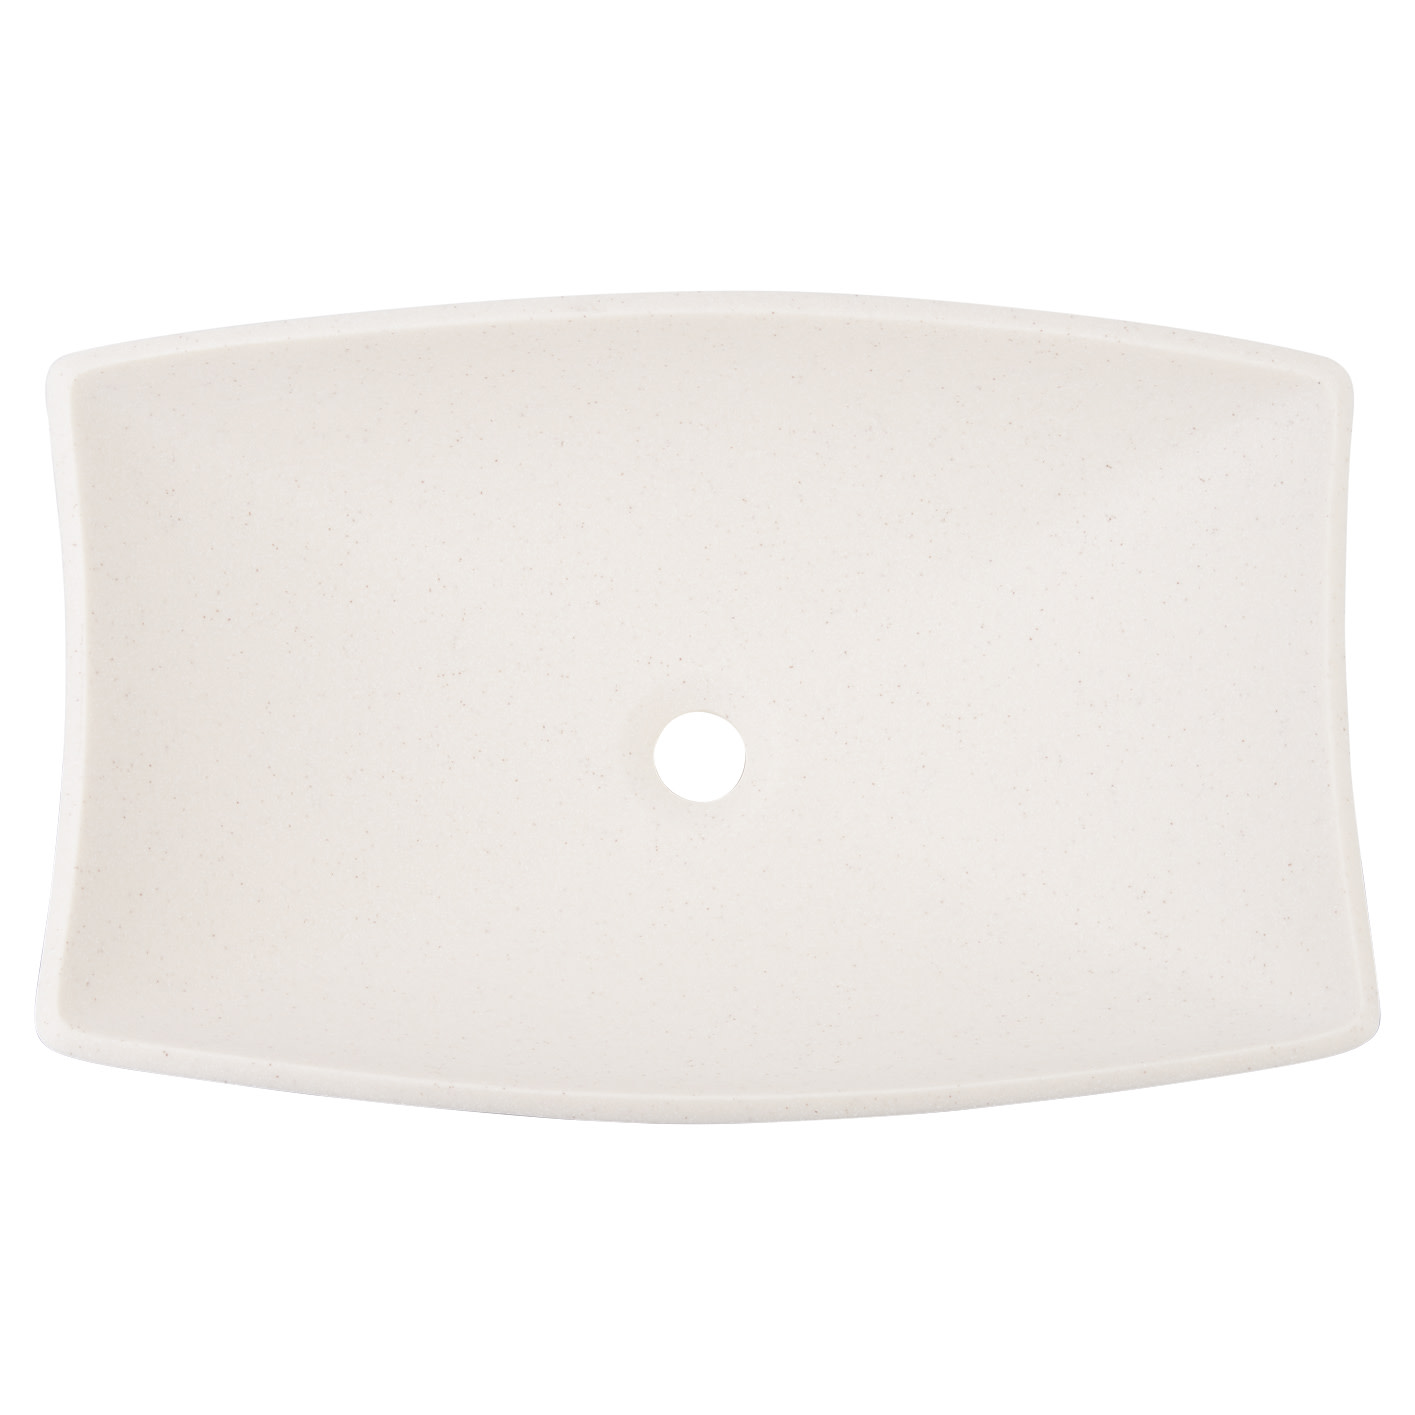 "thumbnail 17 - Signature Hardware 443771 Centauri 24"" Resin Vessel Bathroom Sink"